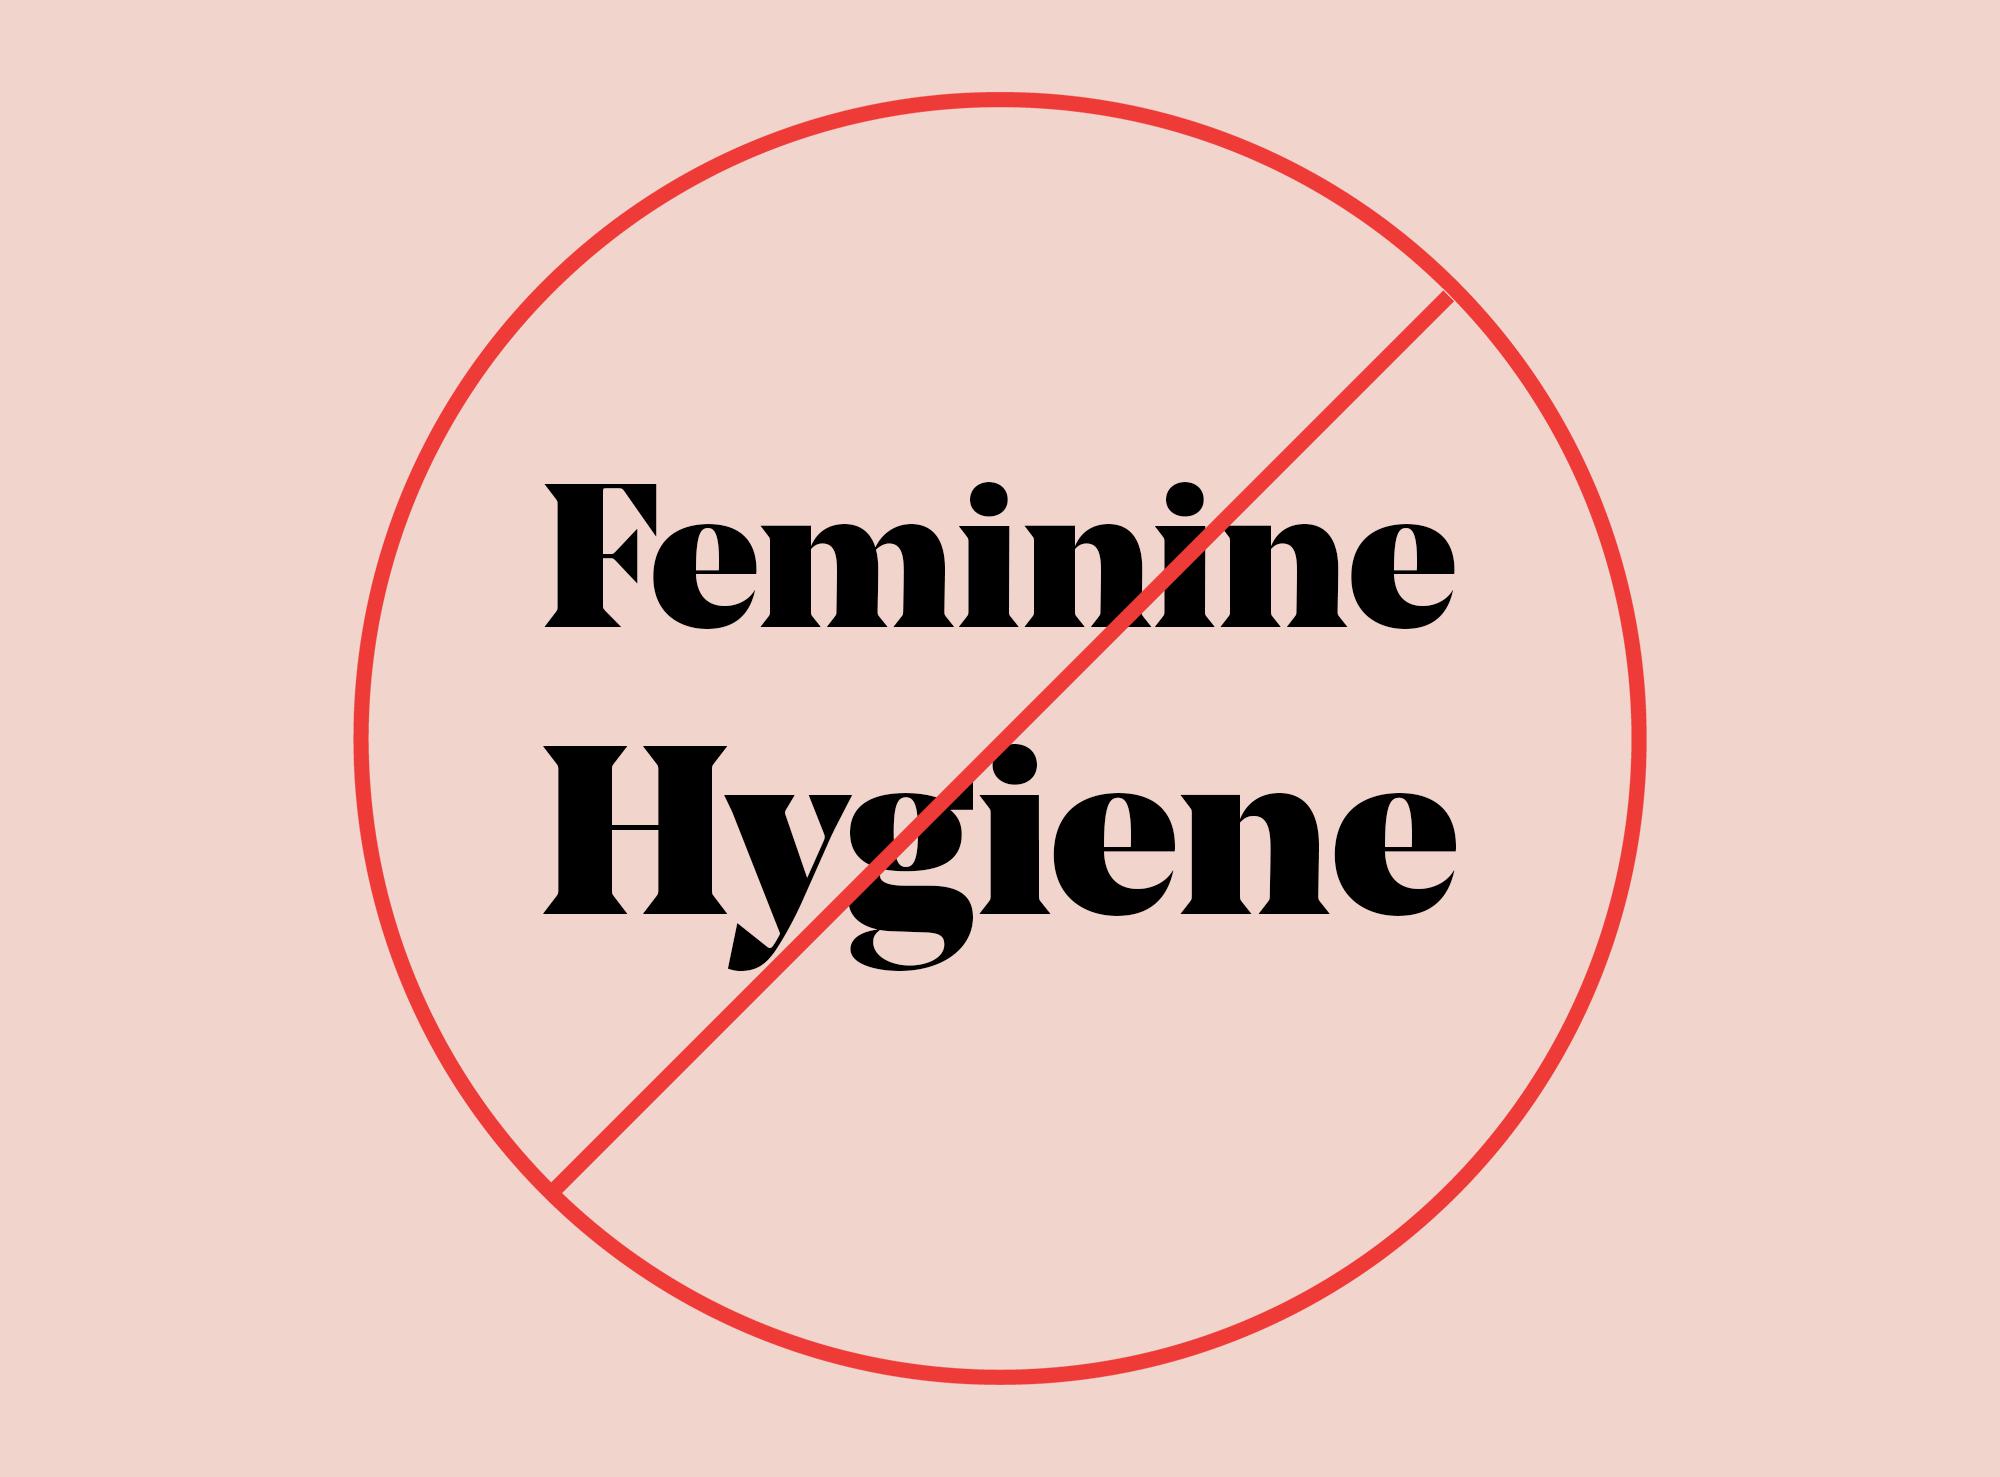 ditch the term feminine hygiene